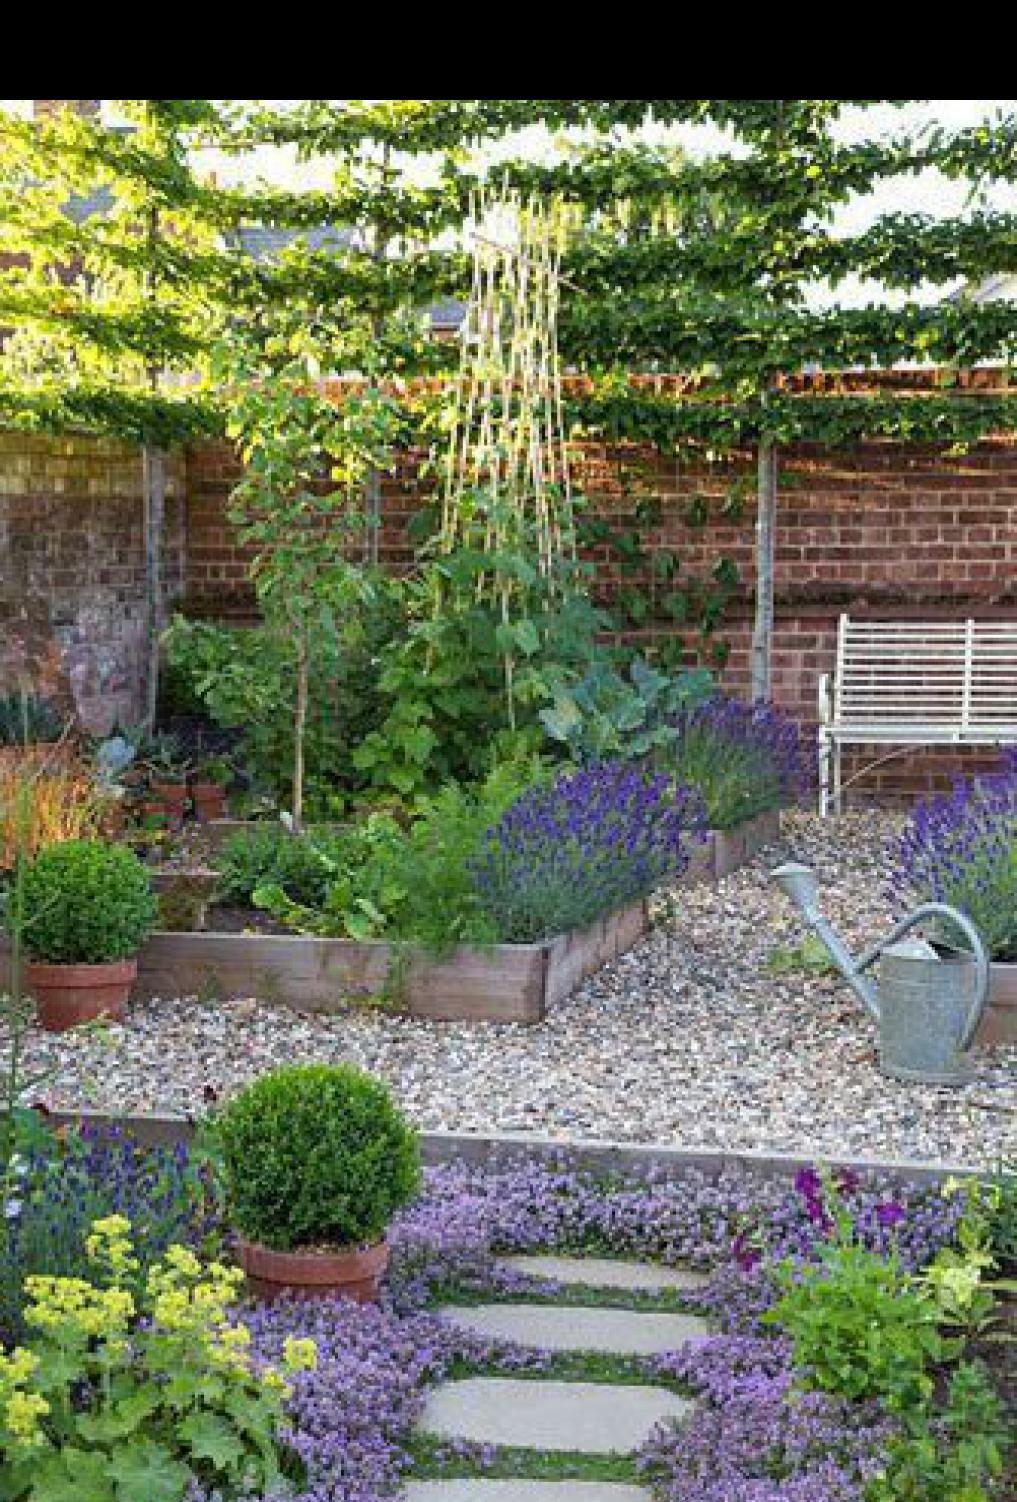 49 Fabulous Backyard Design Ideas On A Budget In 2020 Cottage Garden Design Backyard Landscaping Backyard Garden